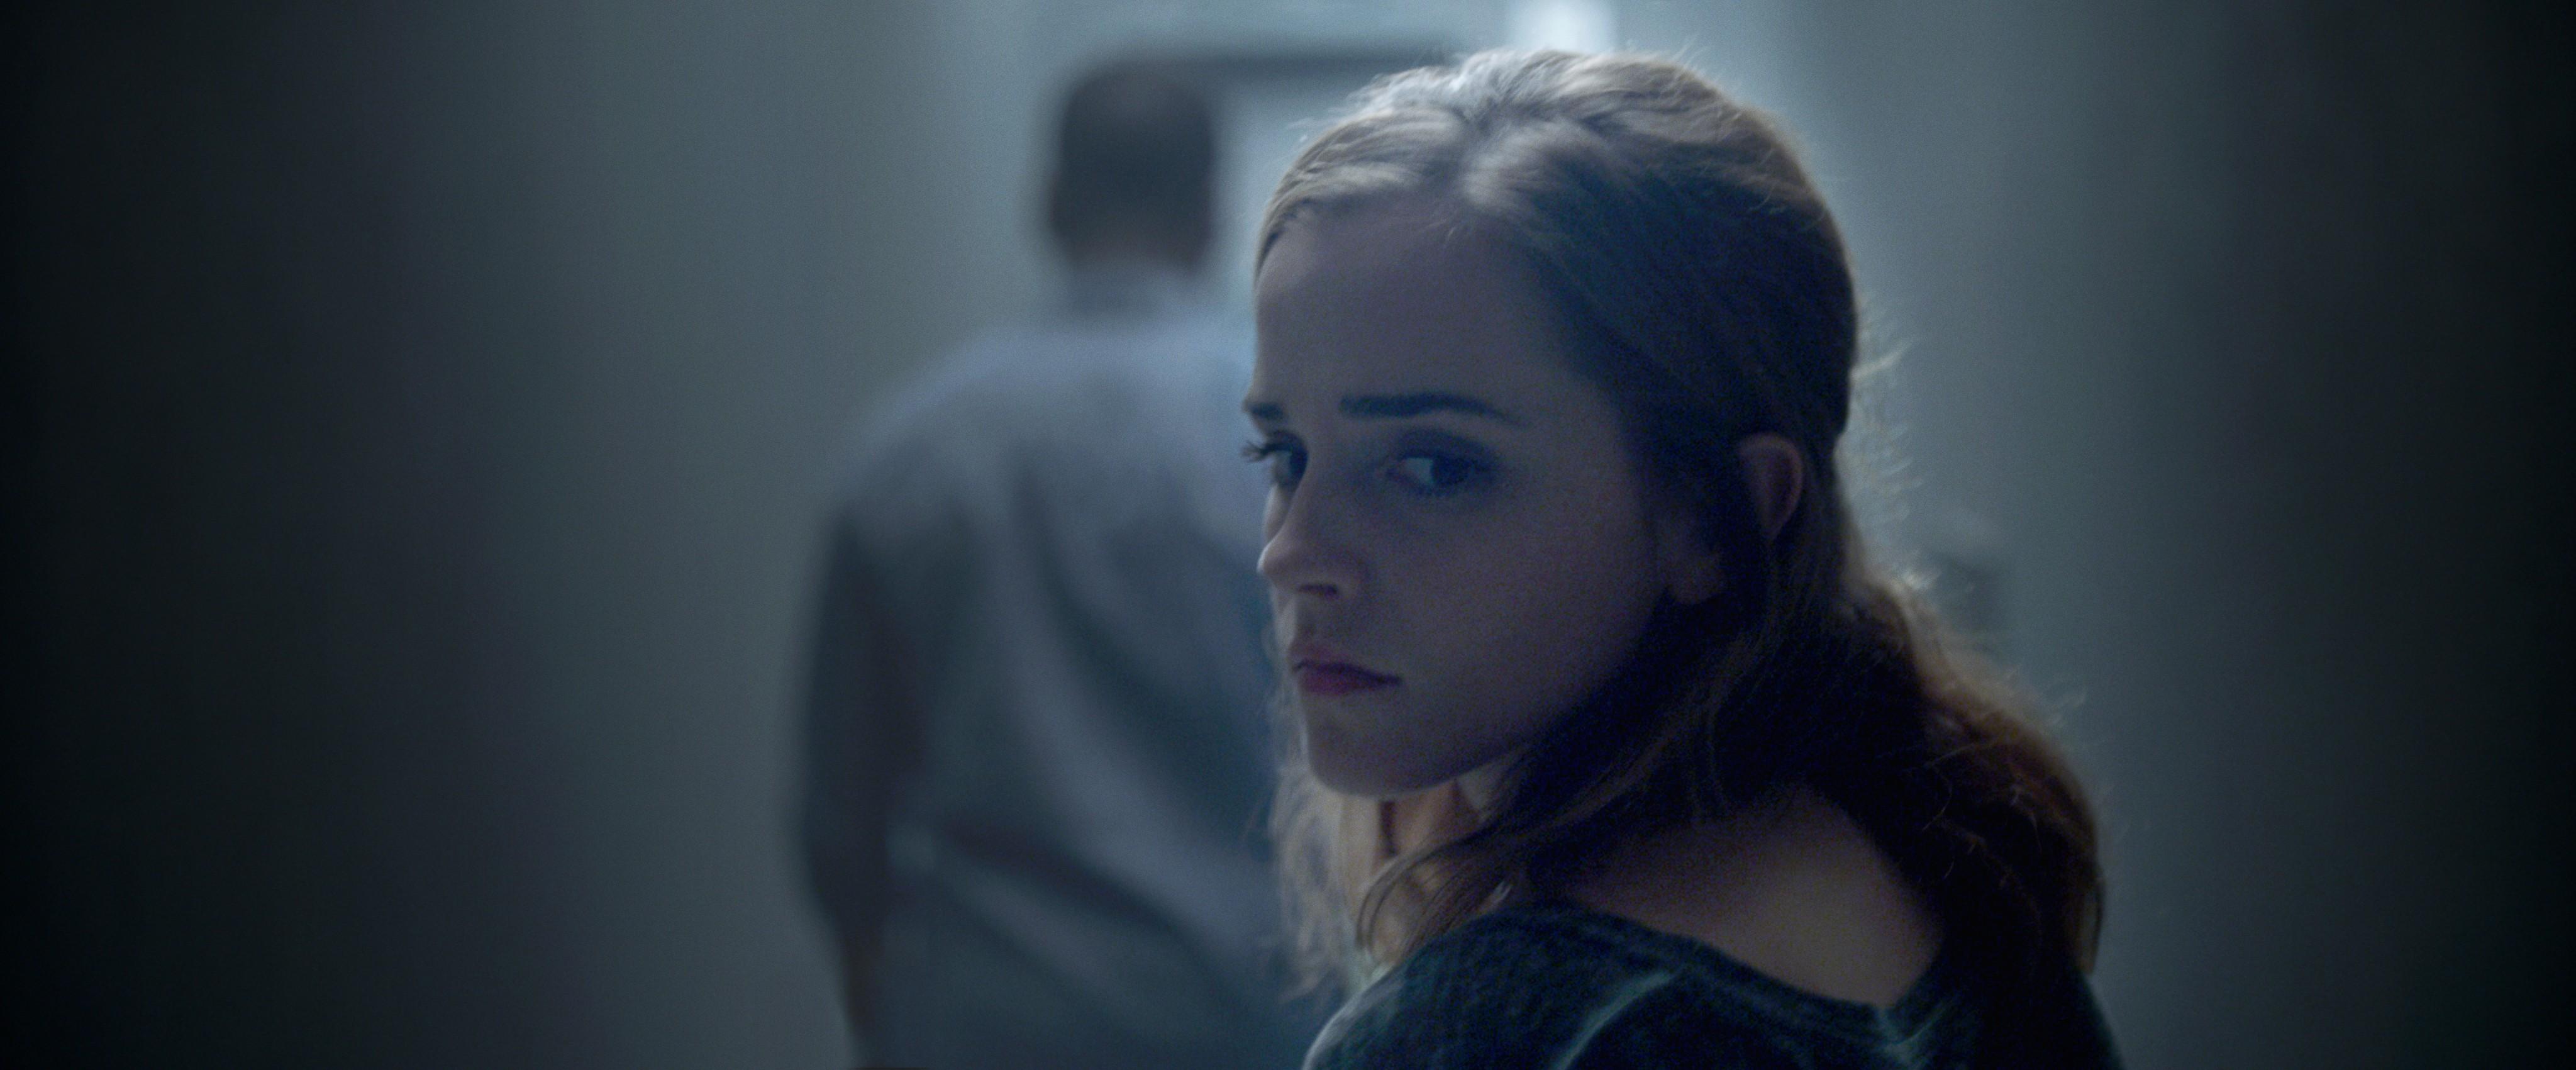 Film - The Circle (2017)